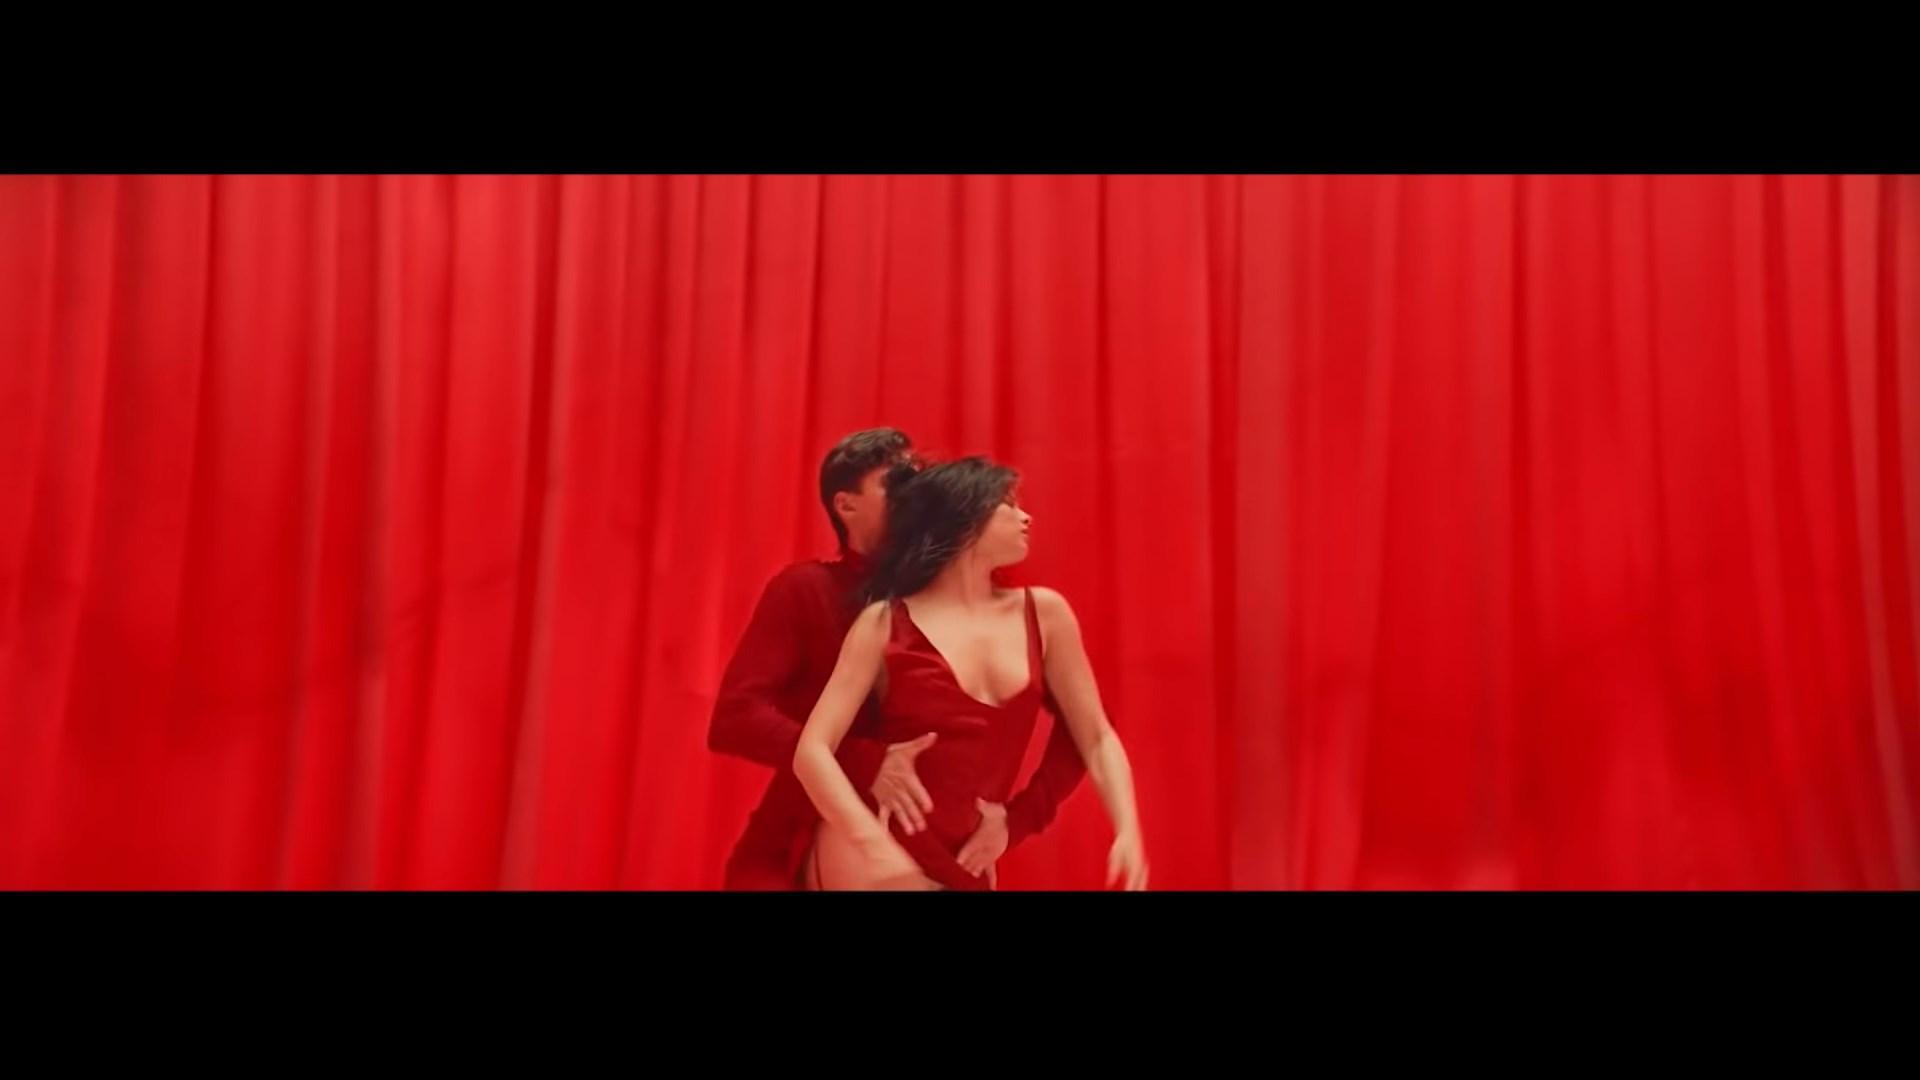 Michelle Andrade - Hasta La Vista - YouTube_3.MKV_snapshot_00.10_[2019.01.09_19.54.03].jpg